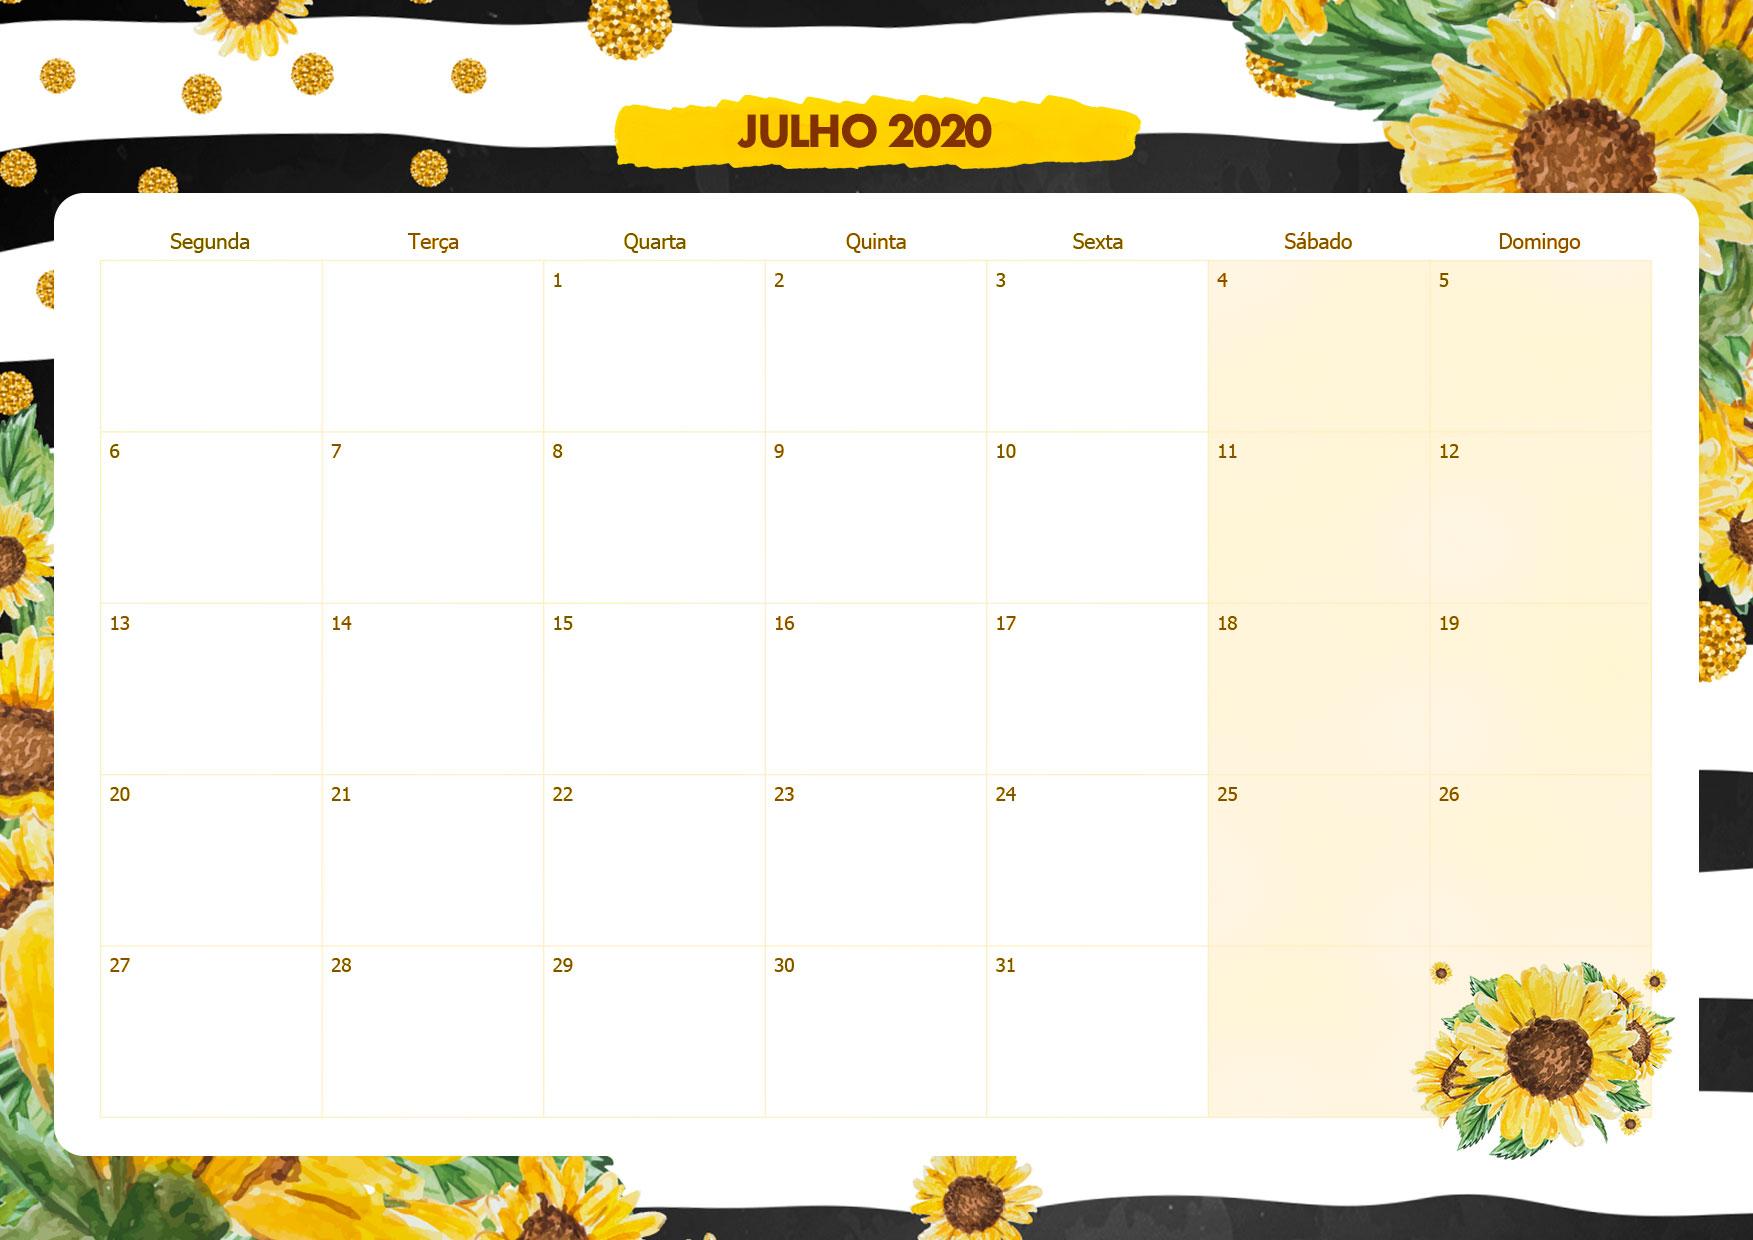 Calendario Mensal Girassol Julho 2020